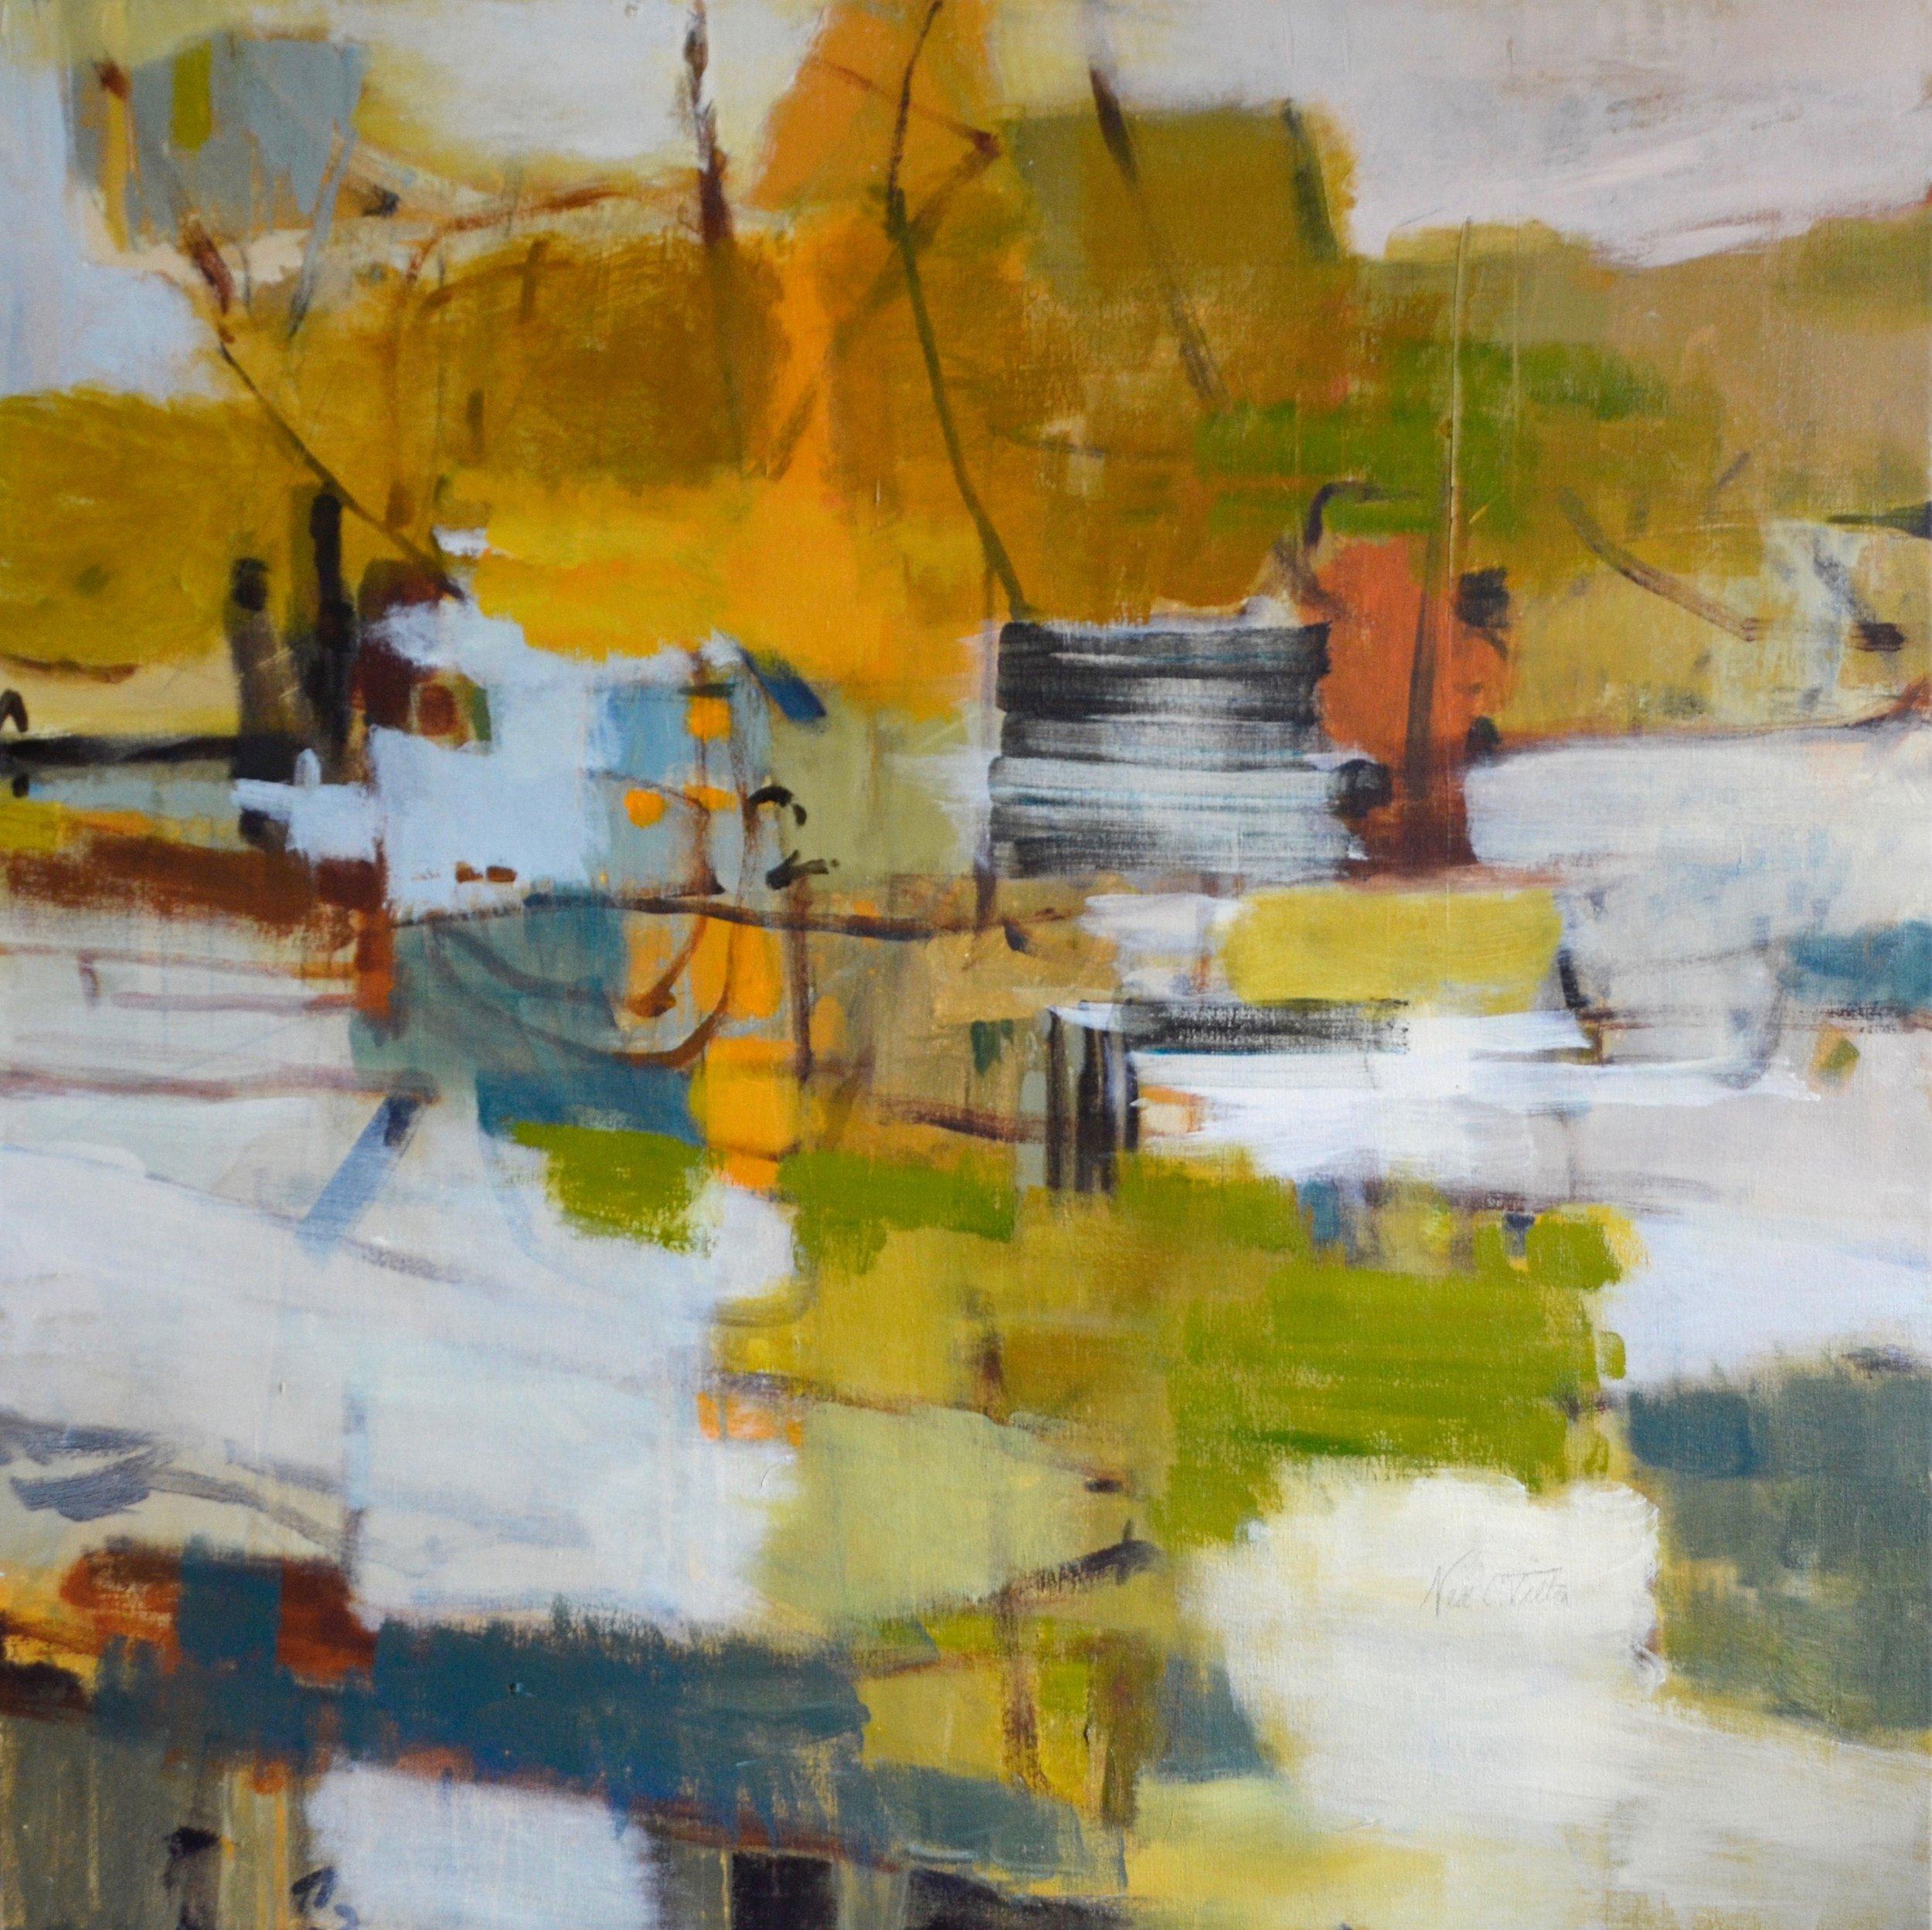 FEELING THE IONS  36 x 36 Acrylic/Mixed Media on Canvas